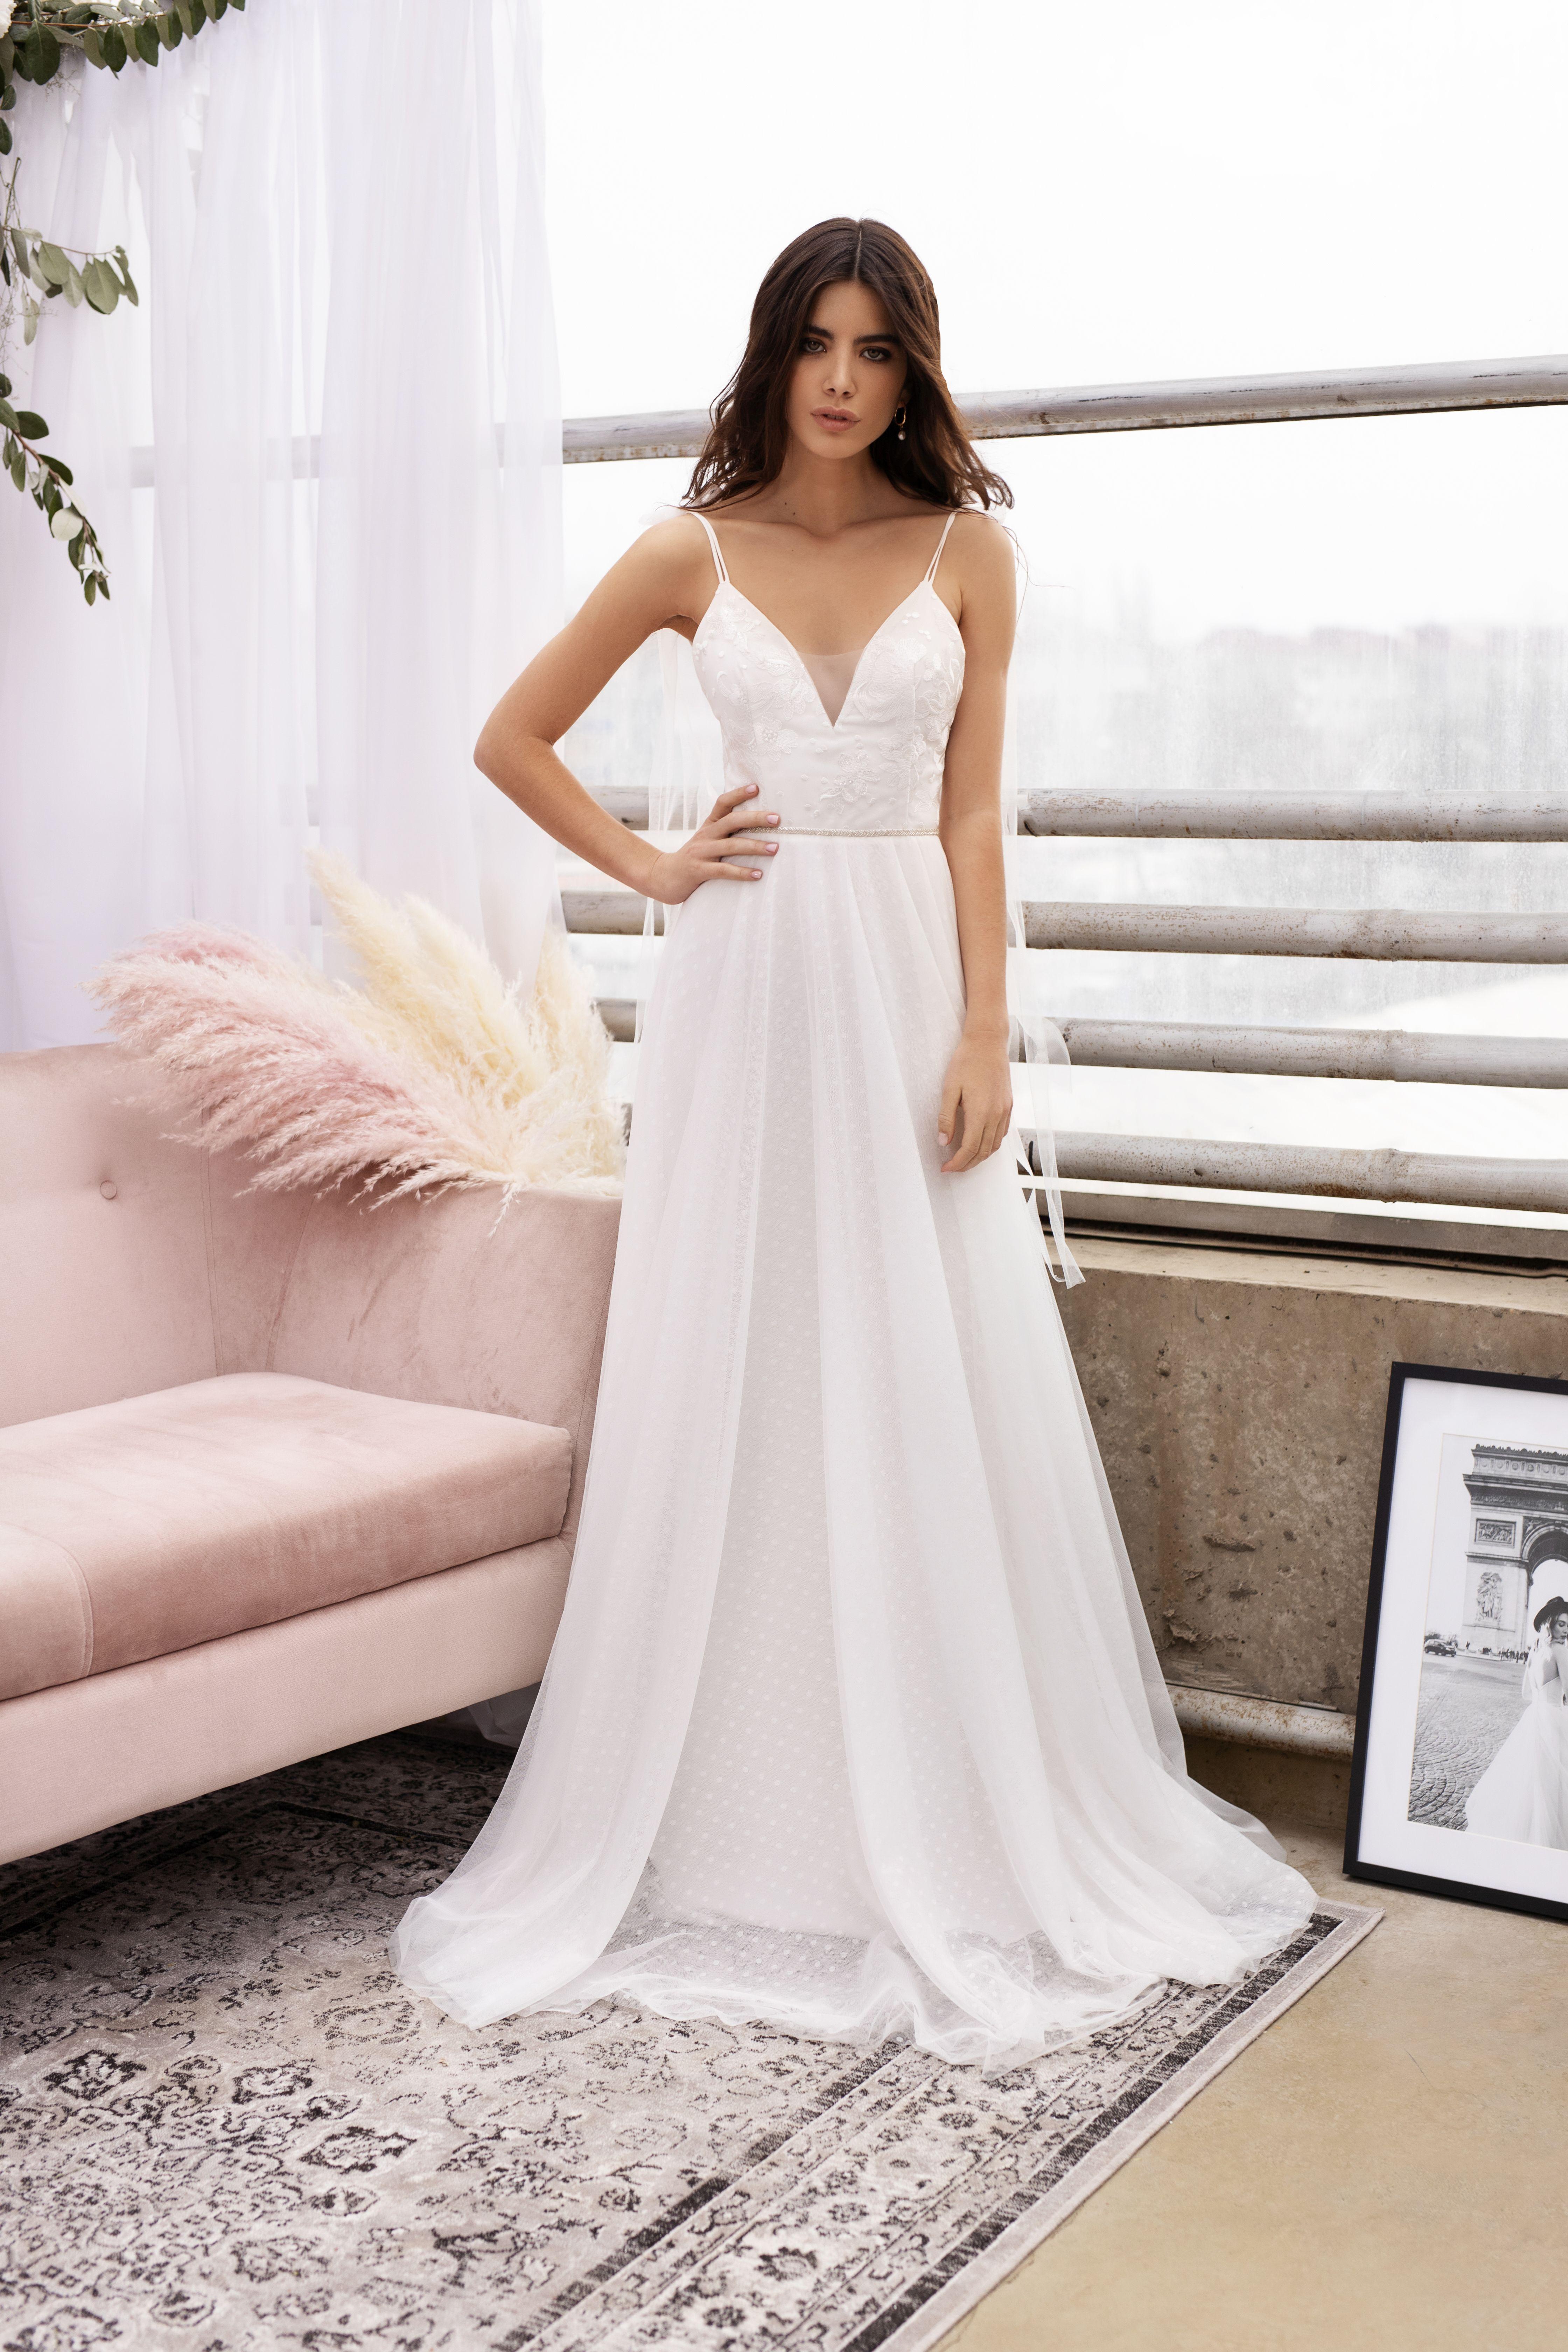 Satin Wedding Dress By Dream Dress Beach Wedding White Evening Prom Or Ball Dress Simple Bridal G Trendy Wedding Dresses Wedding Dresses Simple Bridal Gowns [ 6720 x 4480 Pixel ]